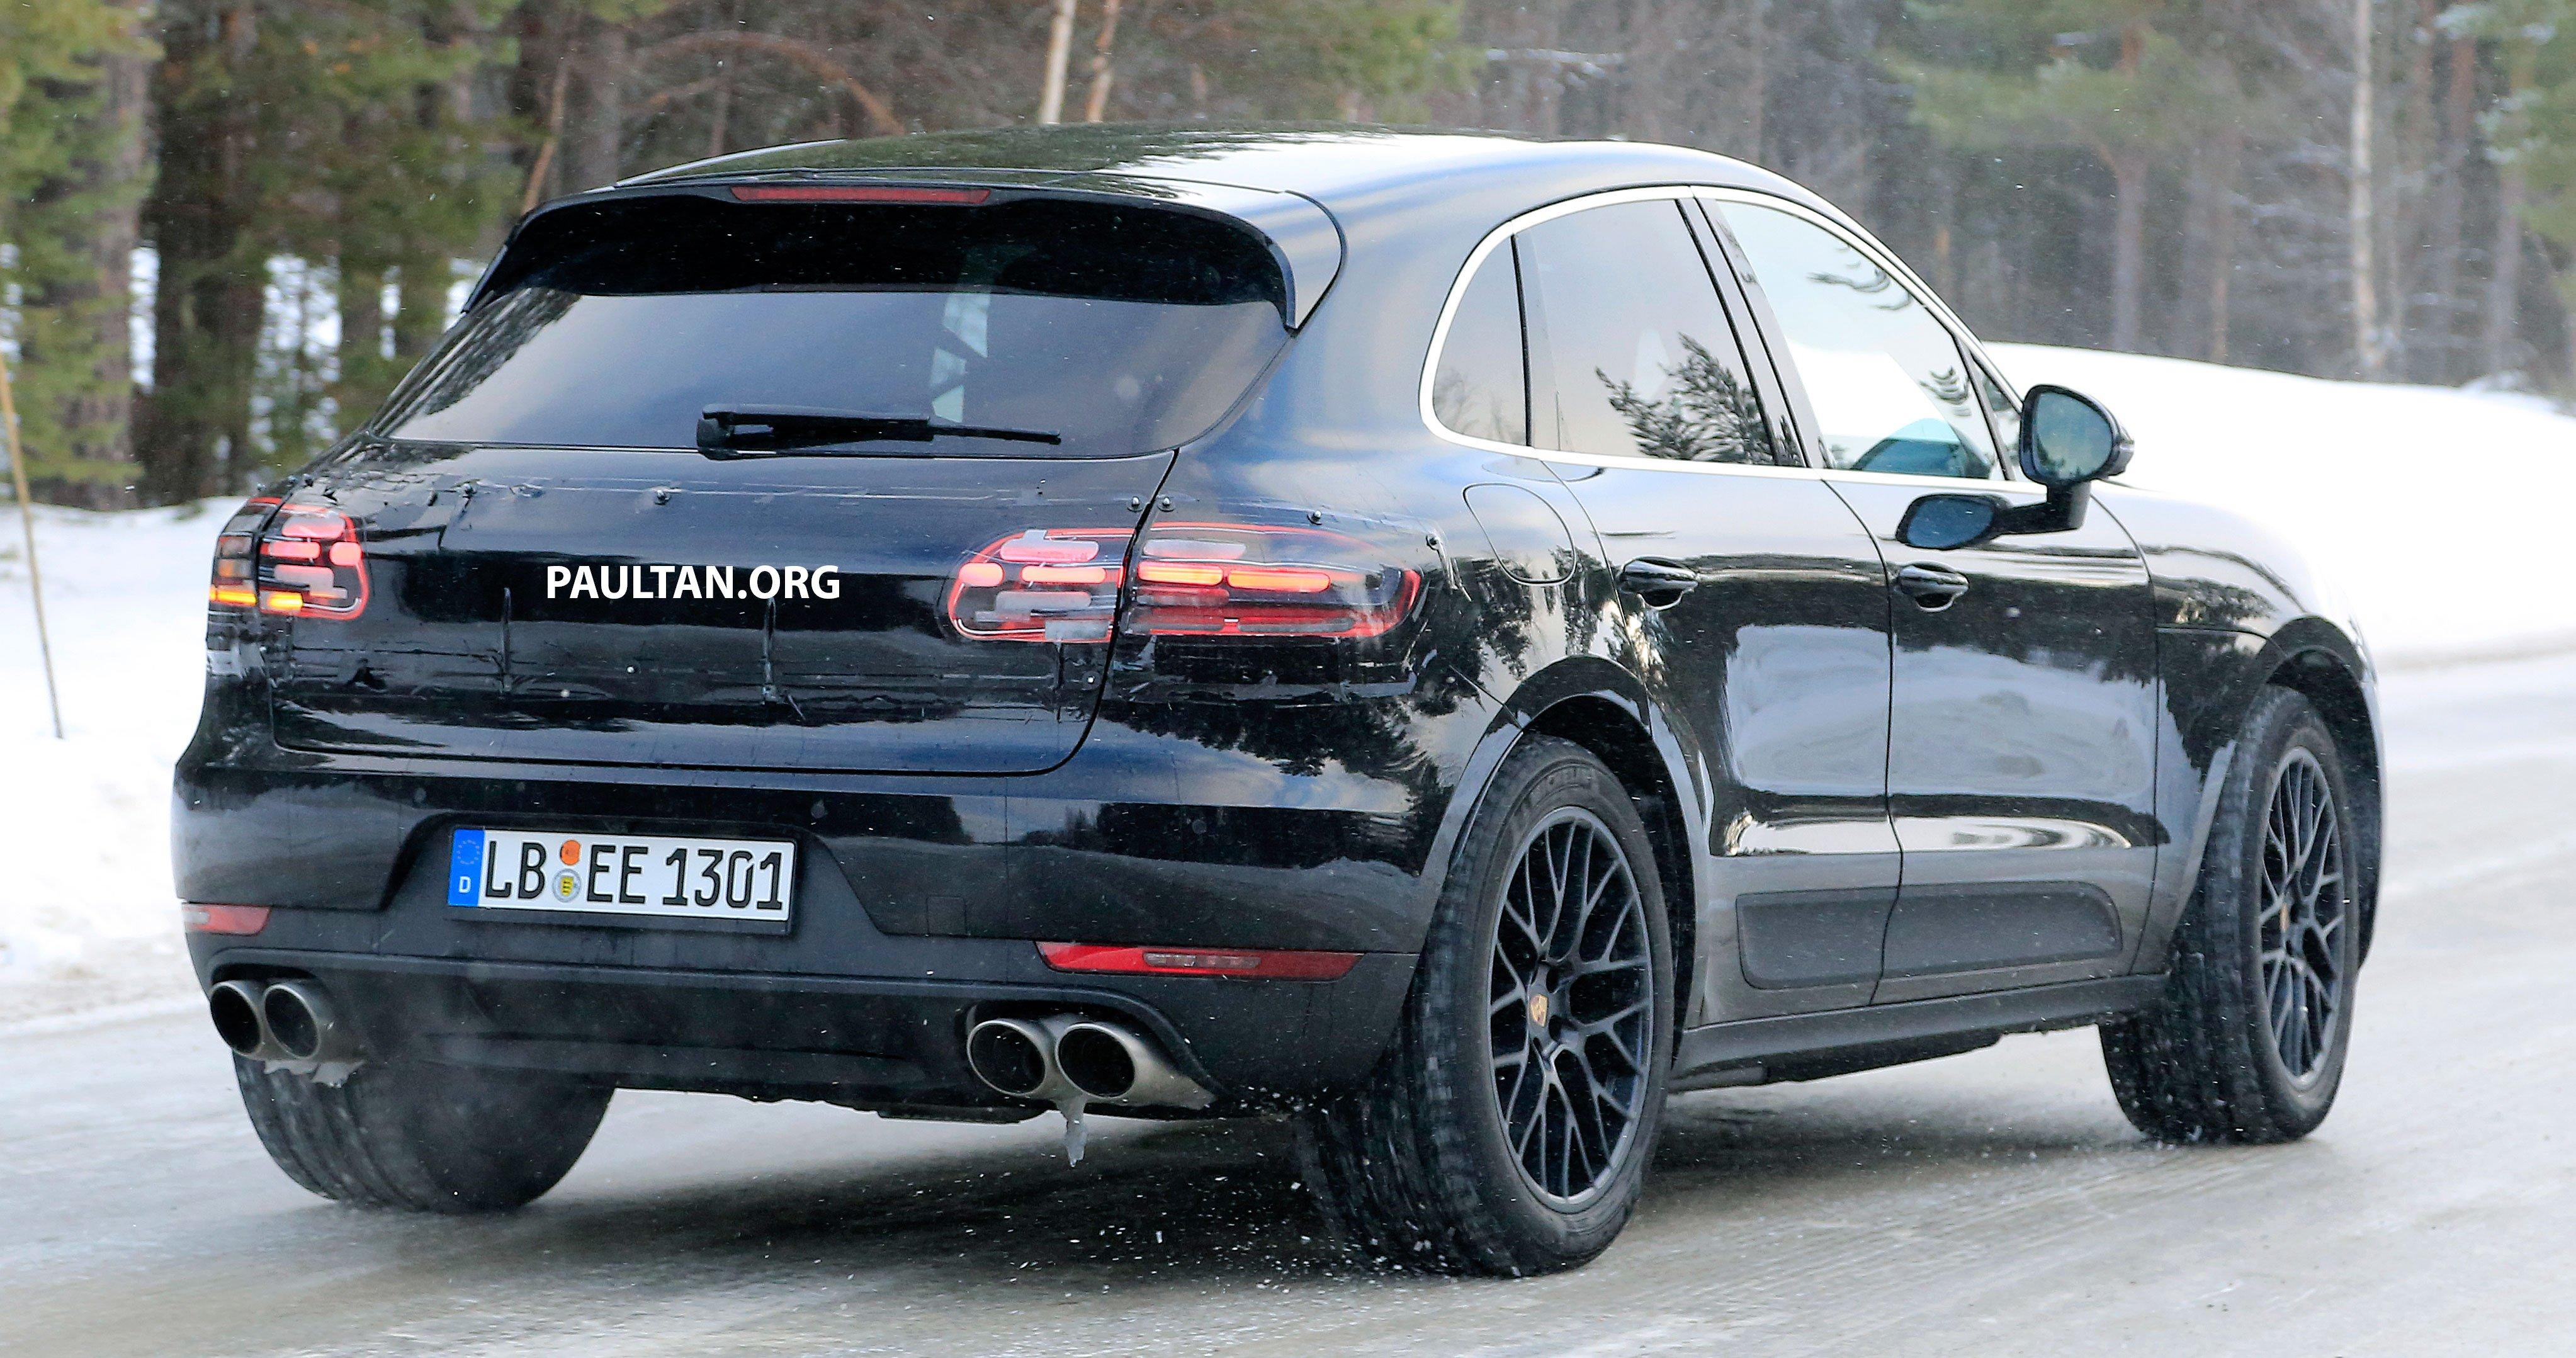 SPIED: Porsche Macan facelift undergoing winter trials Image 613001